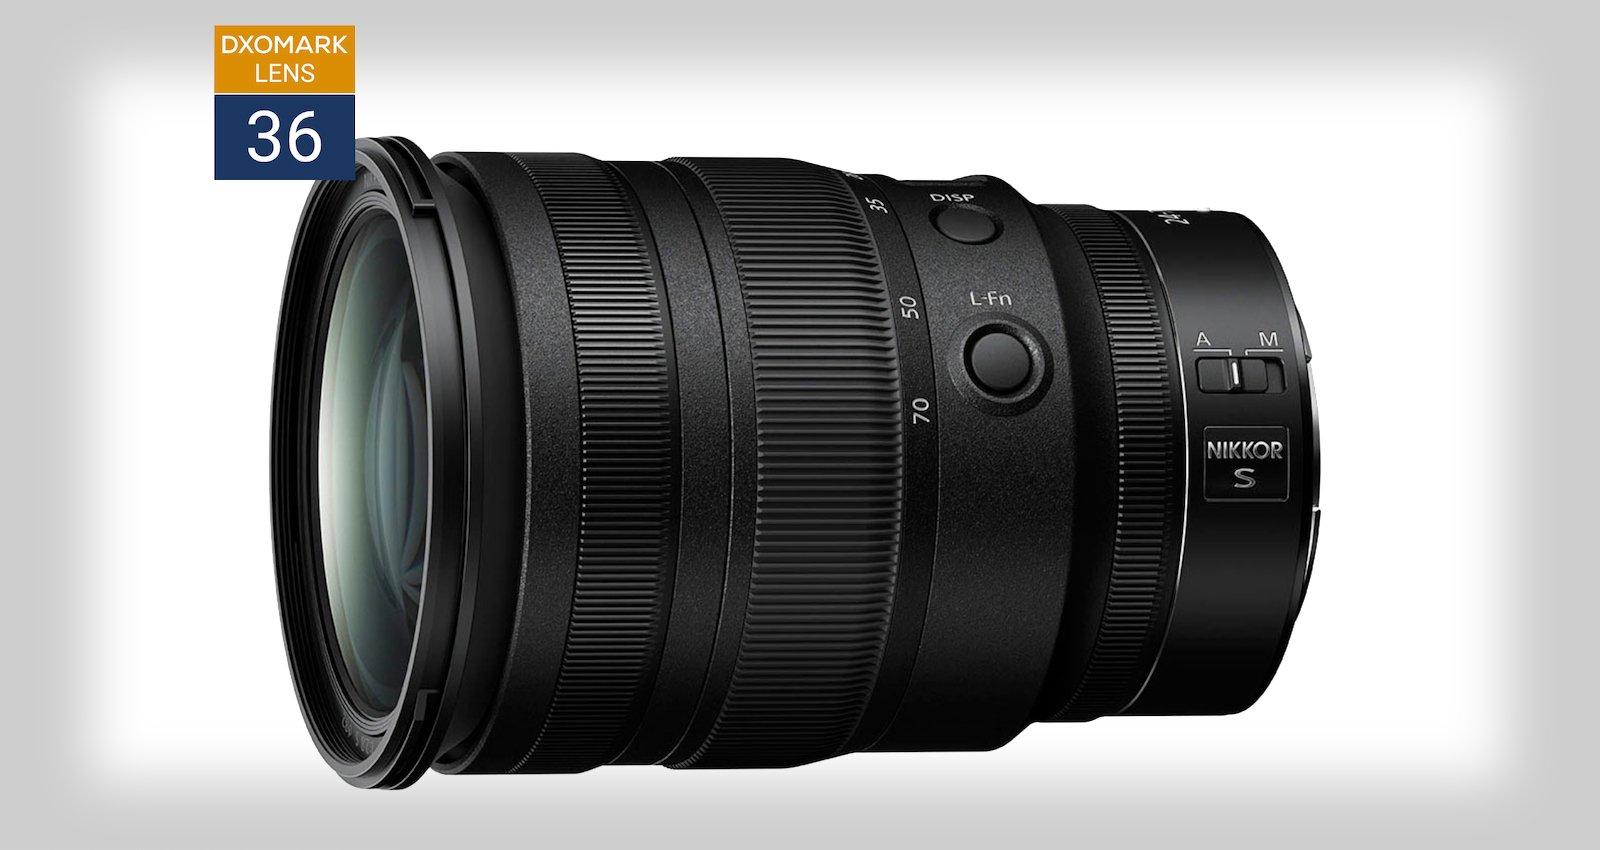 DxO Mark: Nikon's 24-70mm f/2.8 Z-Mount Lens is 'The New Benchmark'